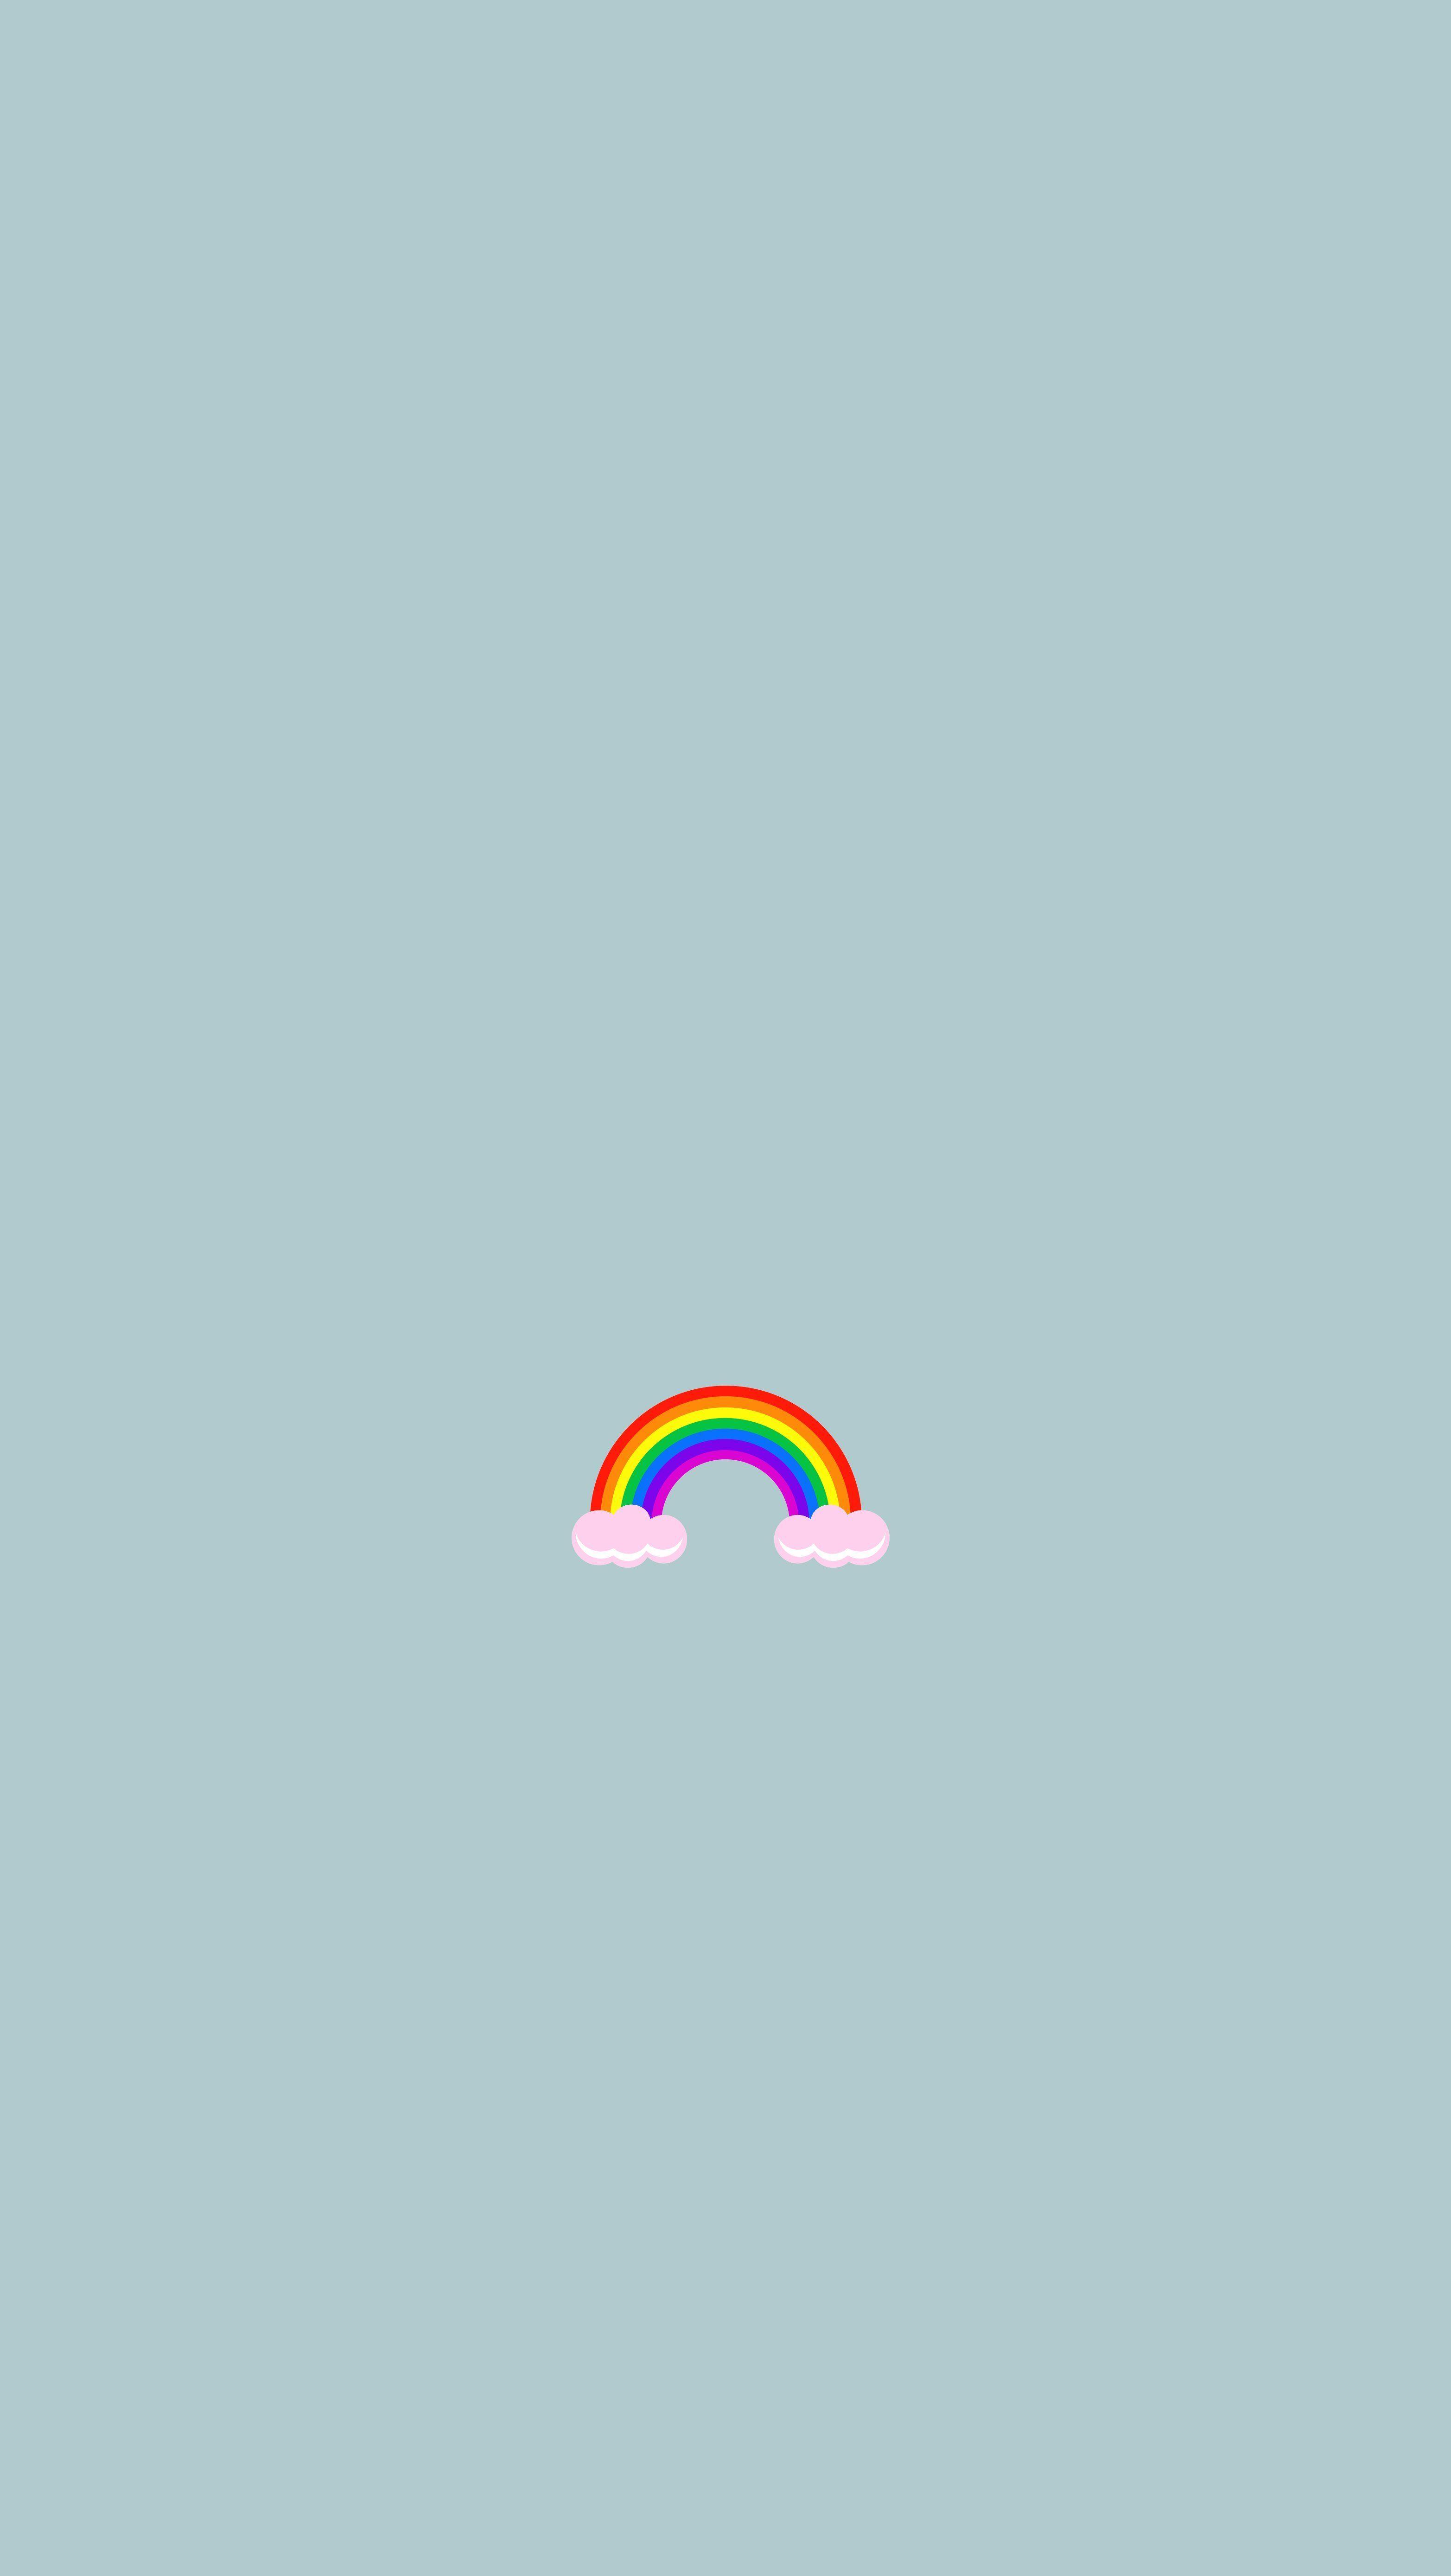 Tumblr Rainbow Wallpaper Aesthetic